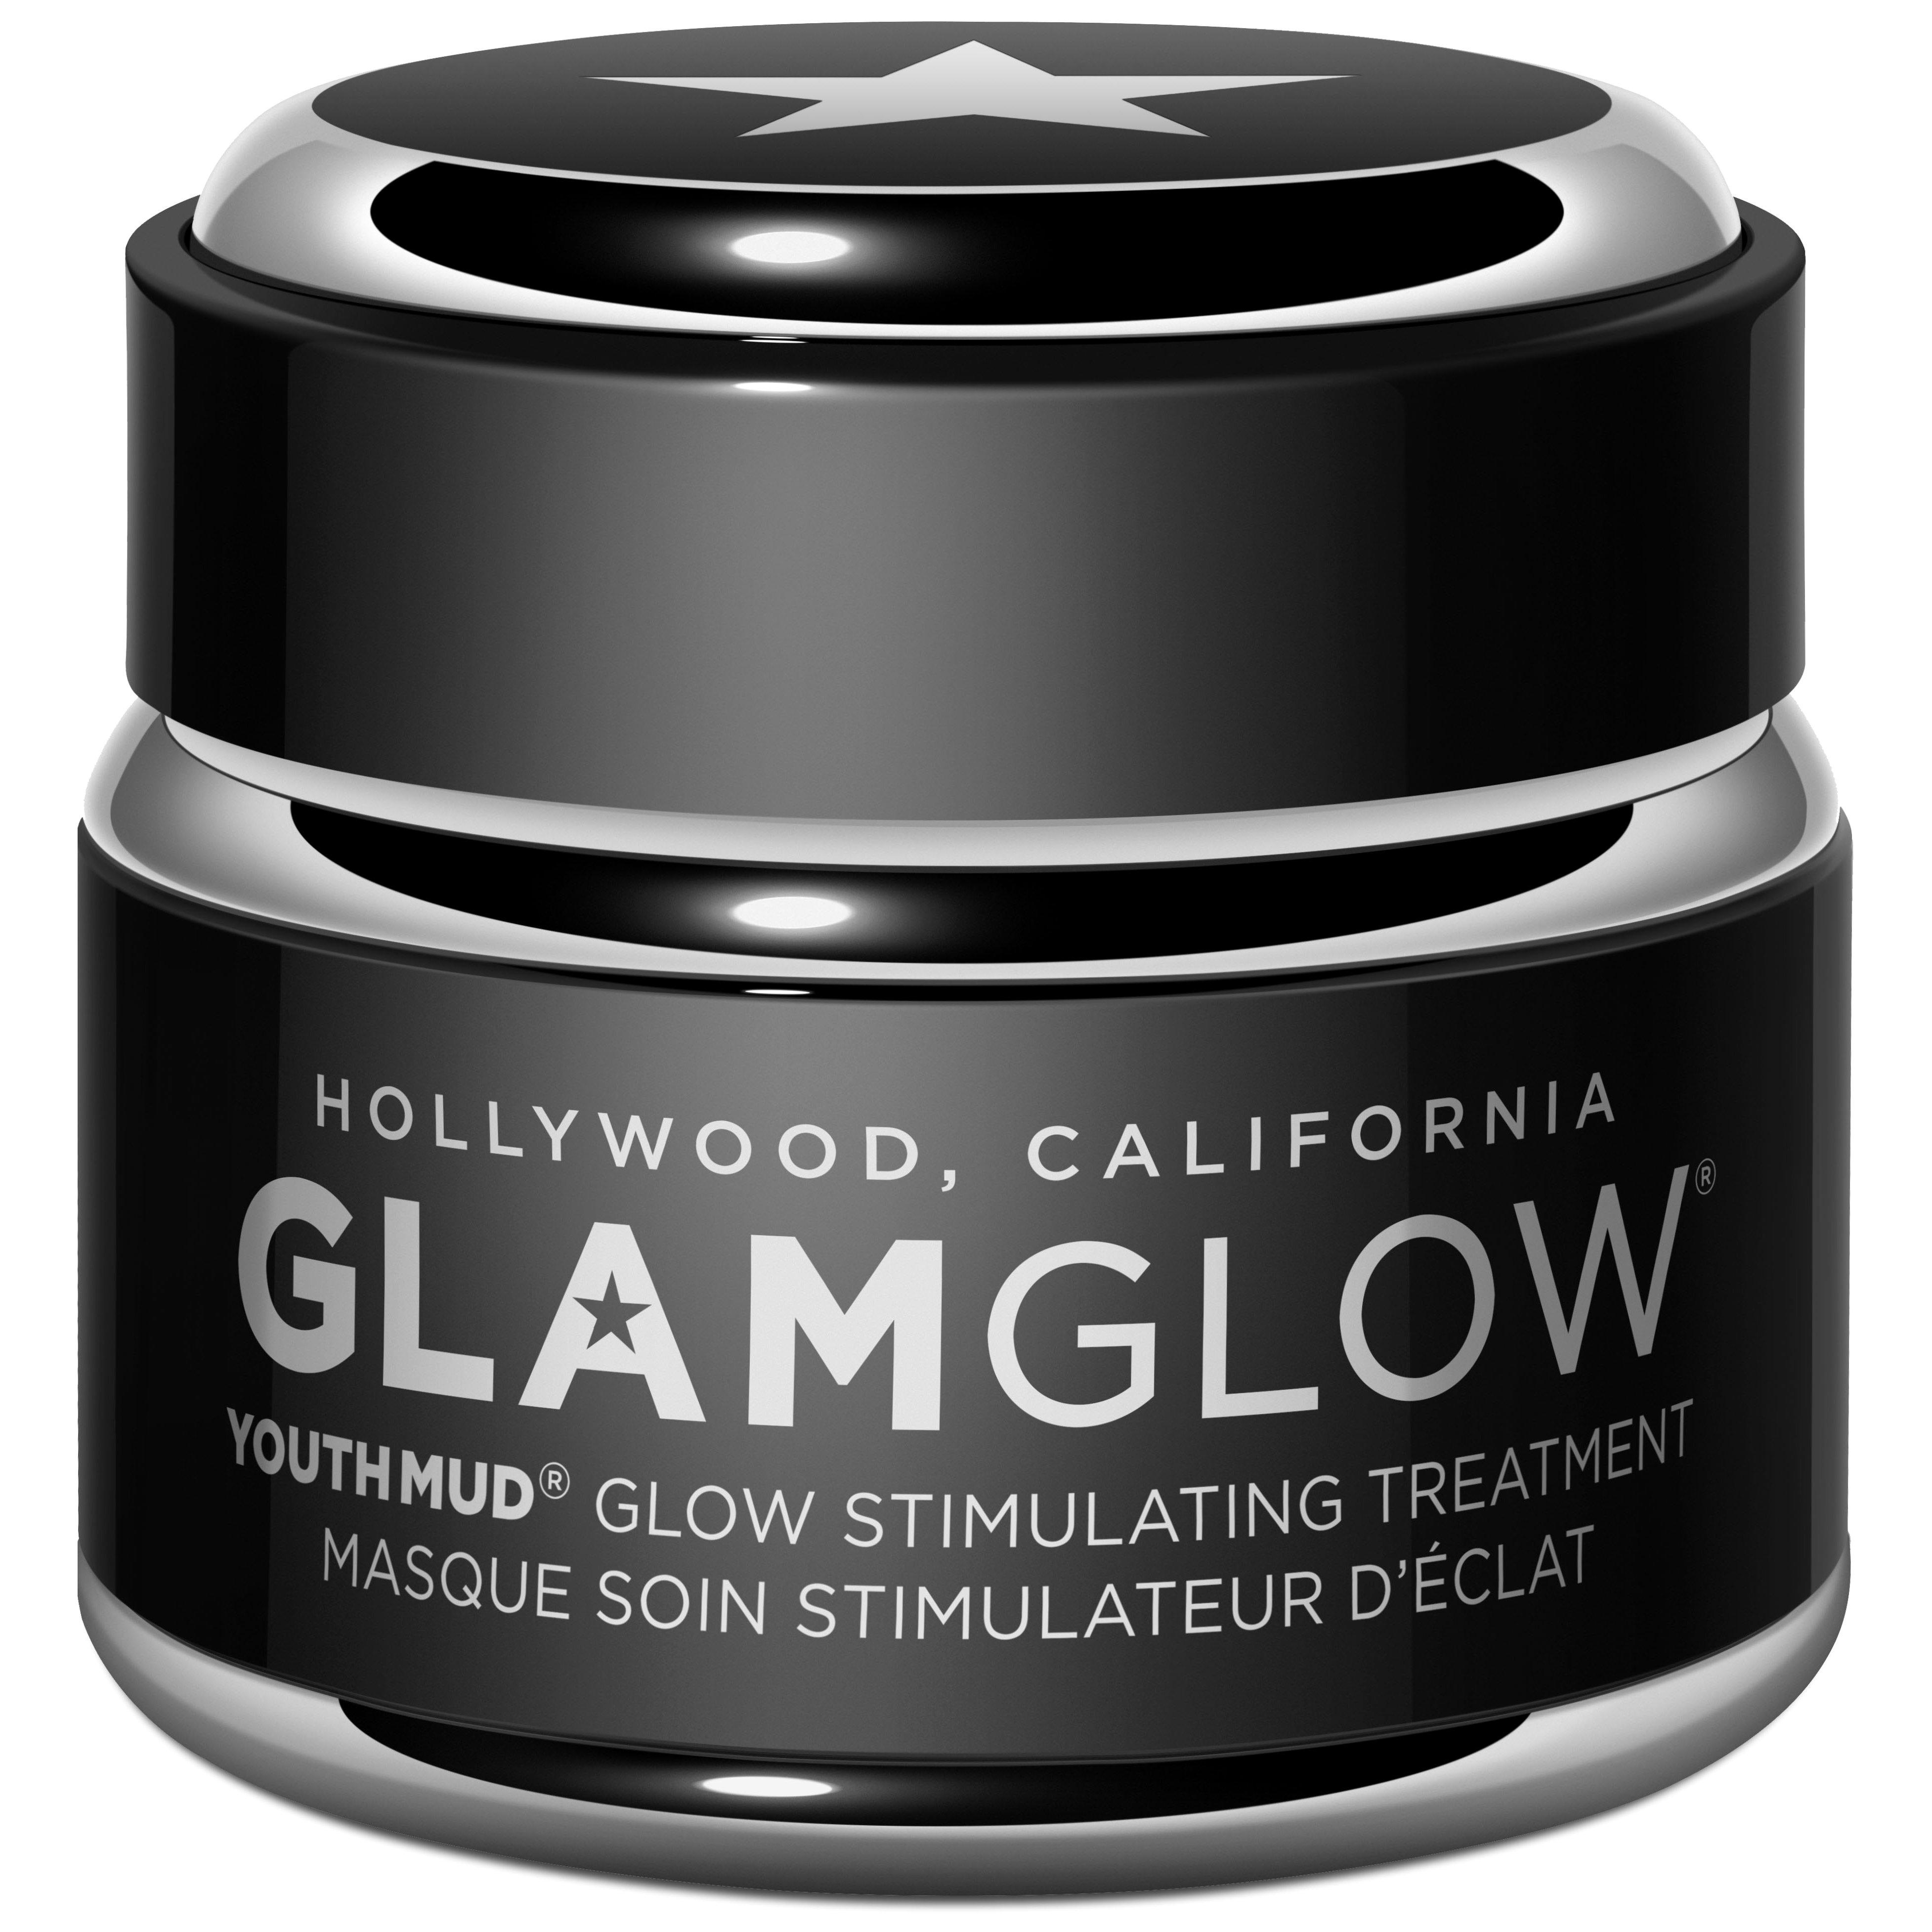 Glamglow Youthmud Glow Stimulating Treatment Mask Μάσκα Προσώπου Απολέπισης & Λάμψης 15g